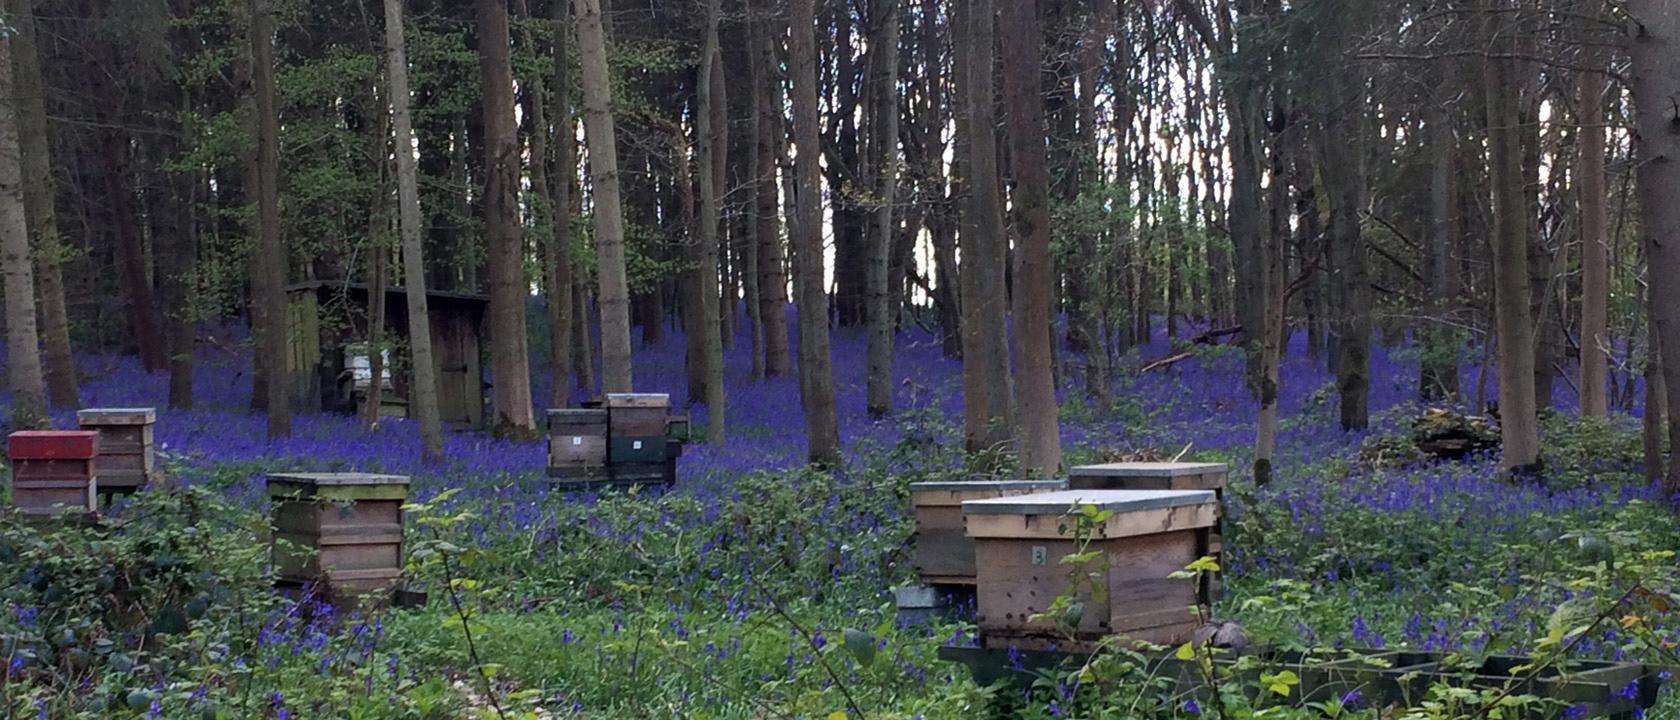 Barrwood Apiary Bluebells